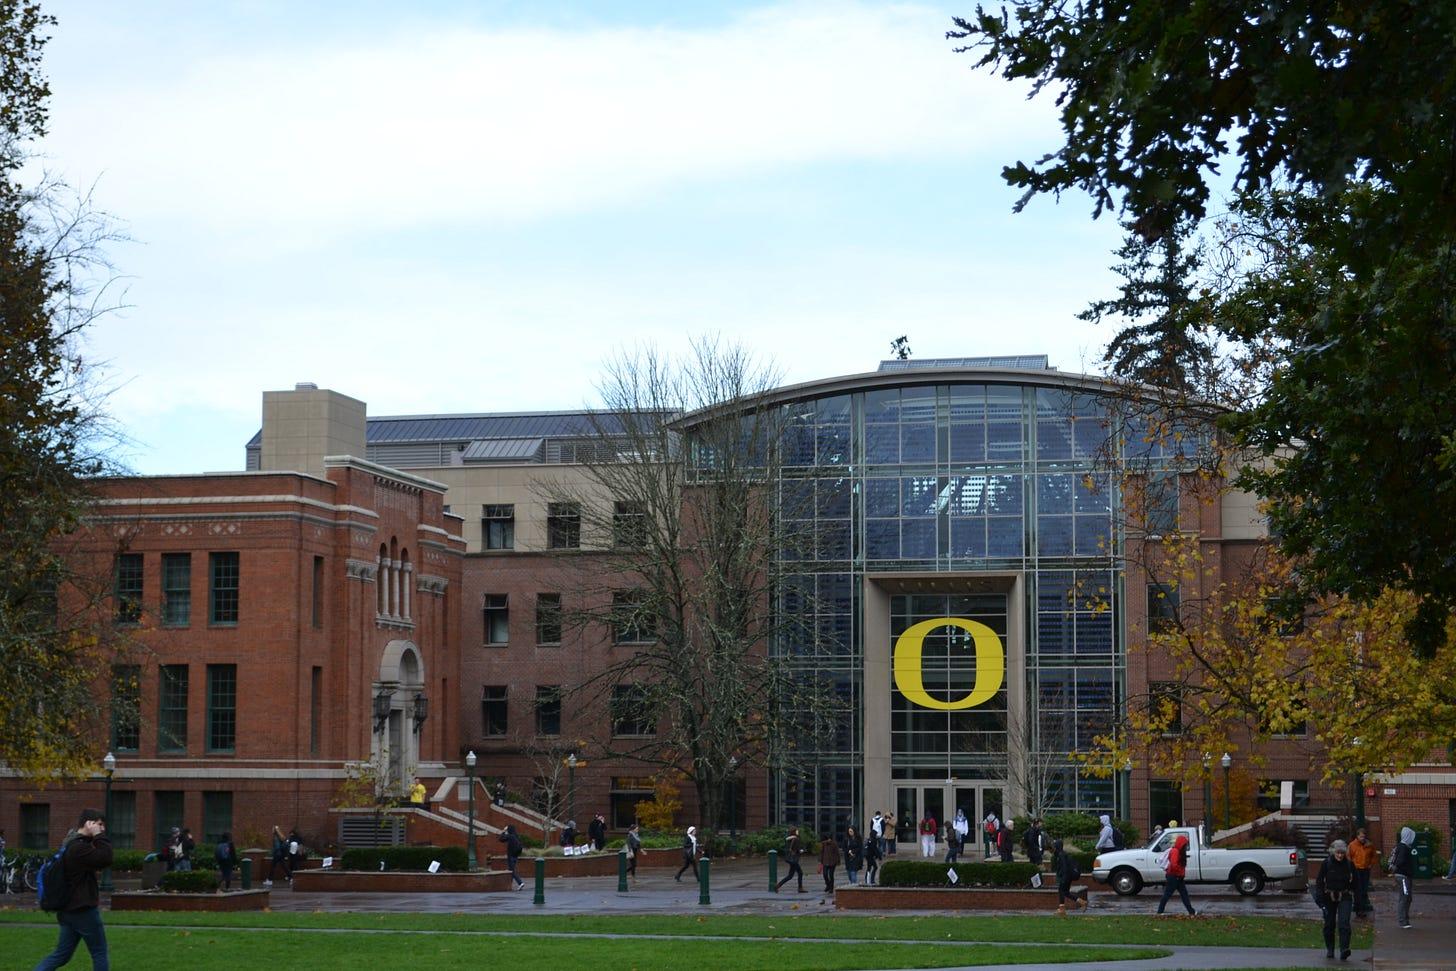 File:Lillis Complex (University of Oregon).jpg